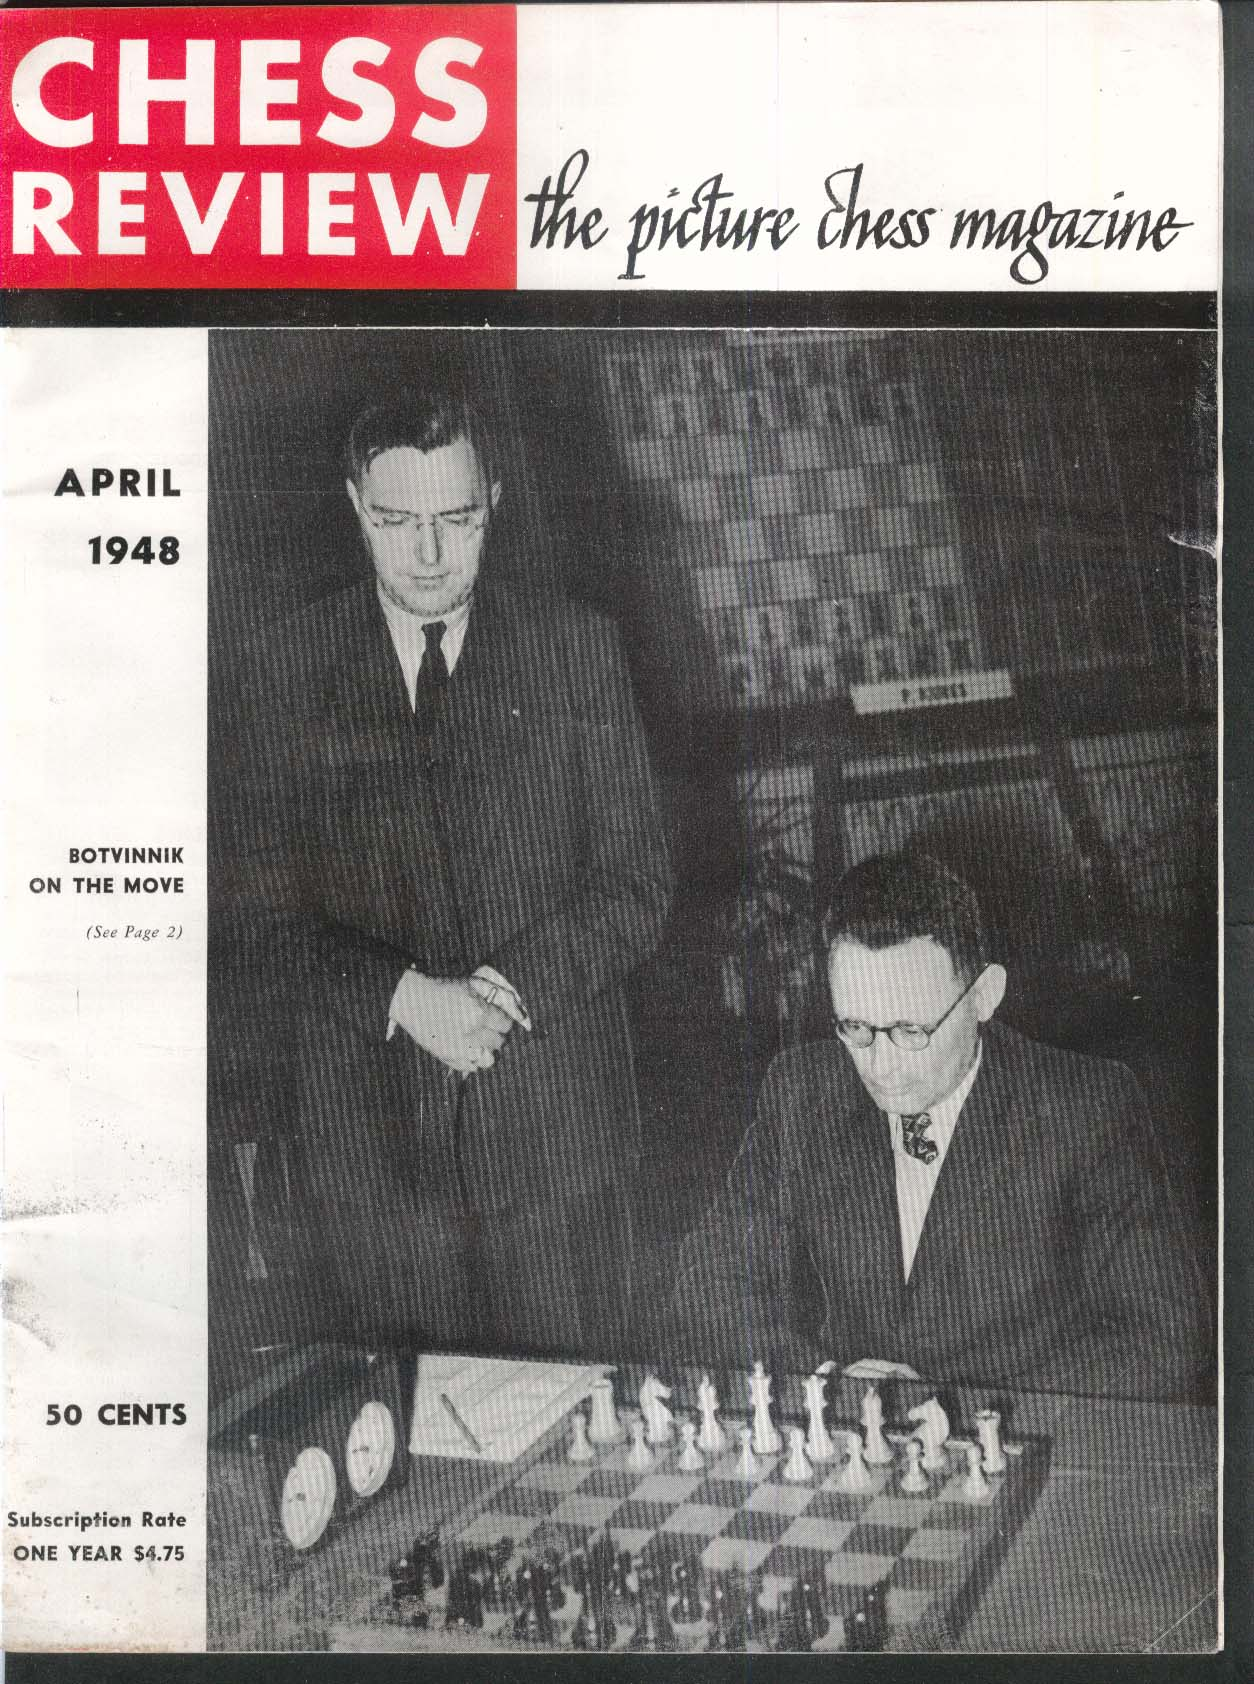 CHESS REVIEW Mikhail Botvinnik Carlos Fleurquin Paul Keres 4 1948